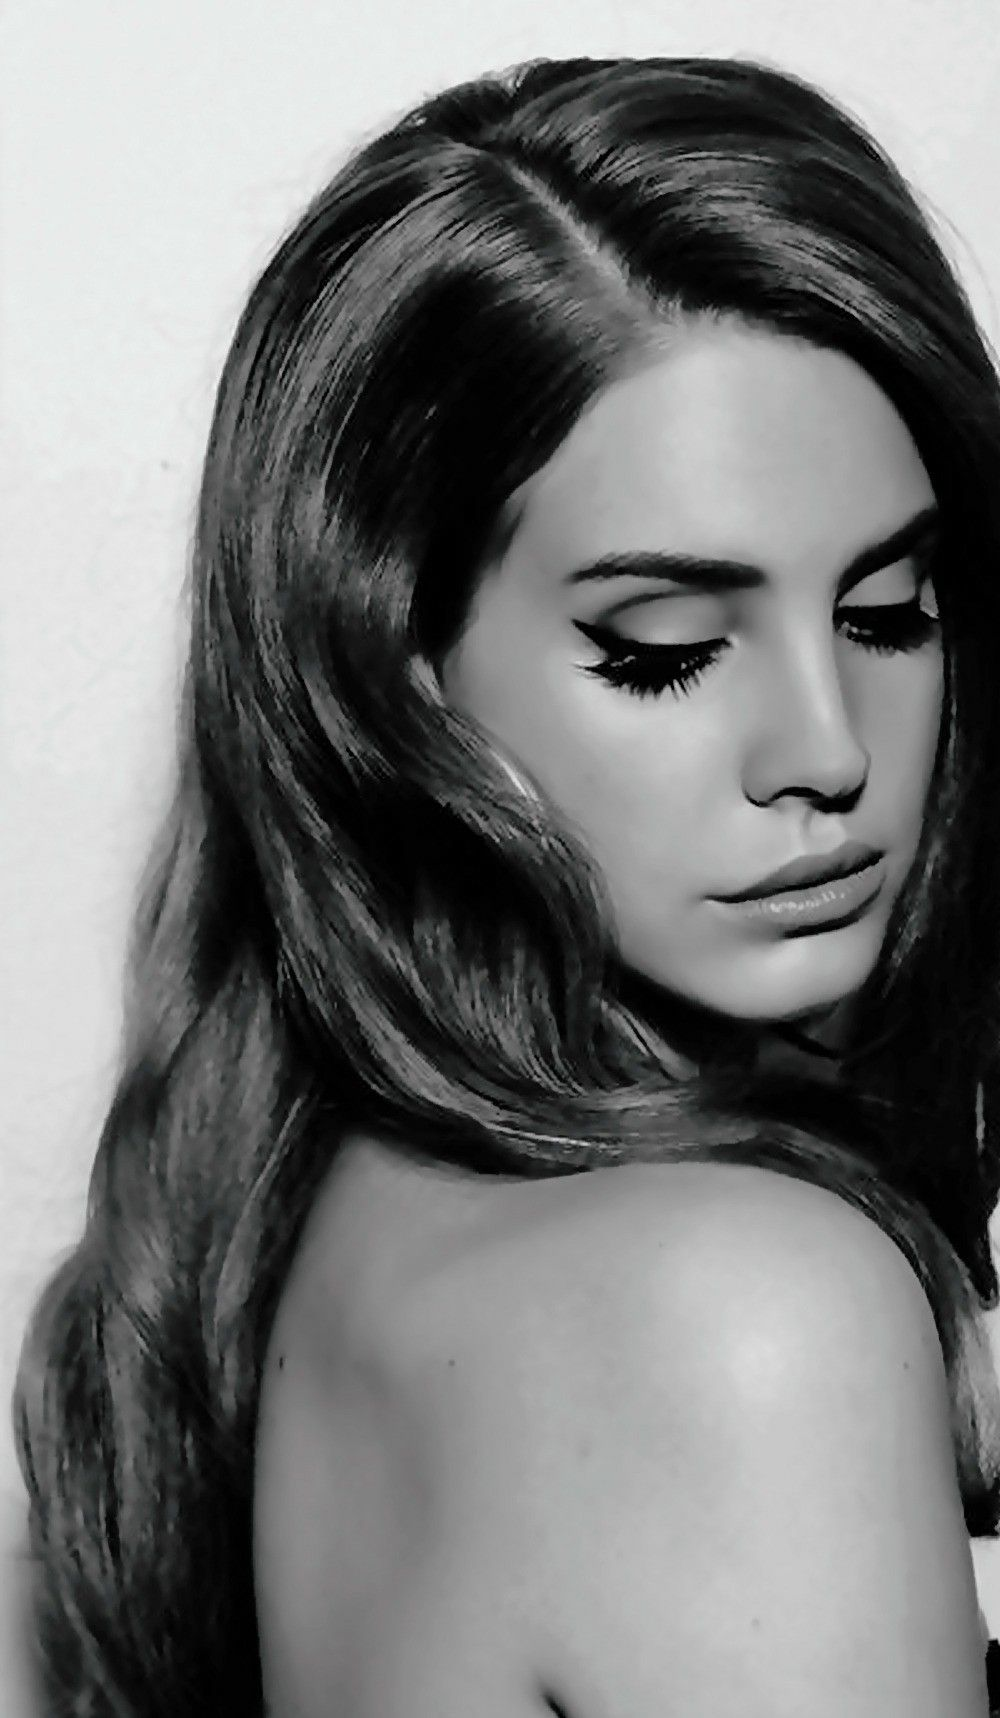 Lana Del Rey Wallpaper Lana Del Rey Lana Del Lana Del Rey Lyrics